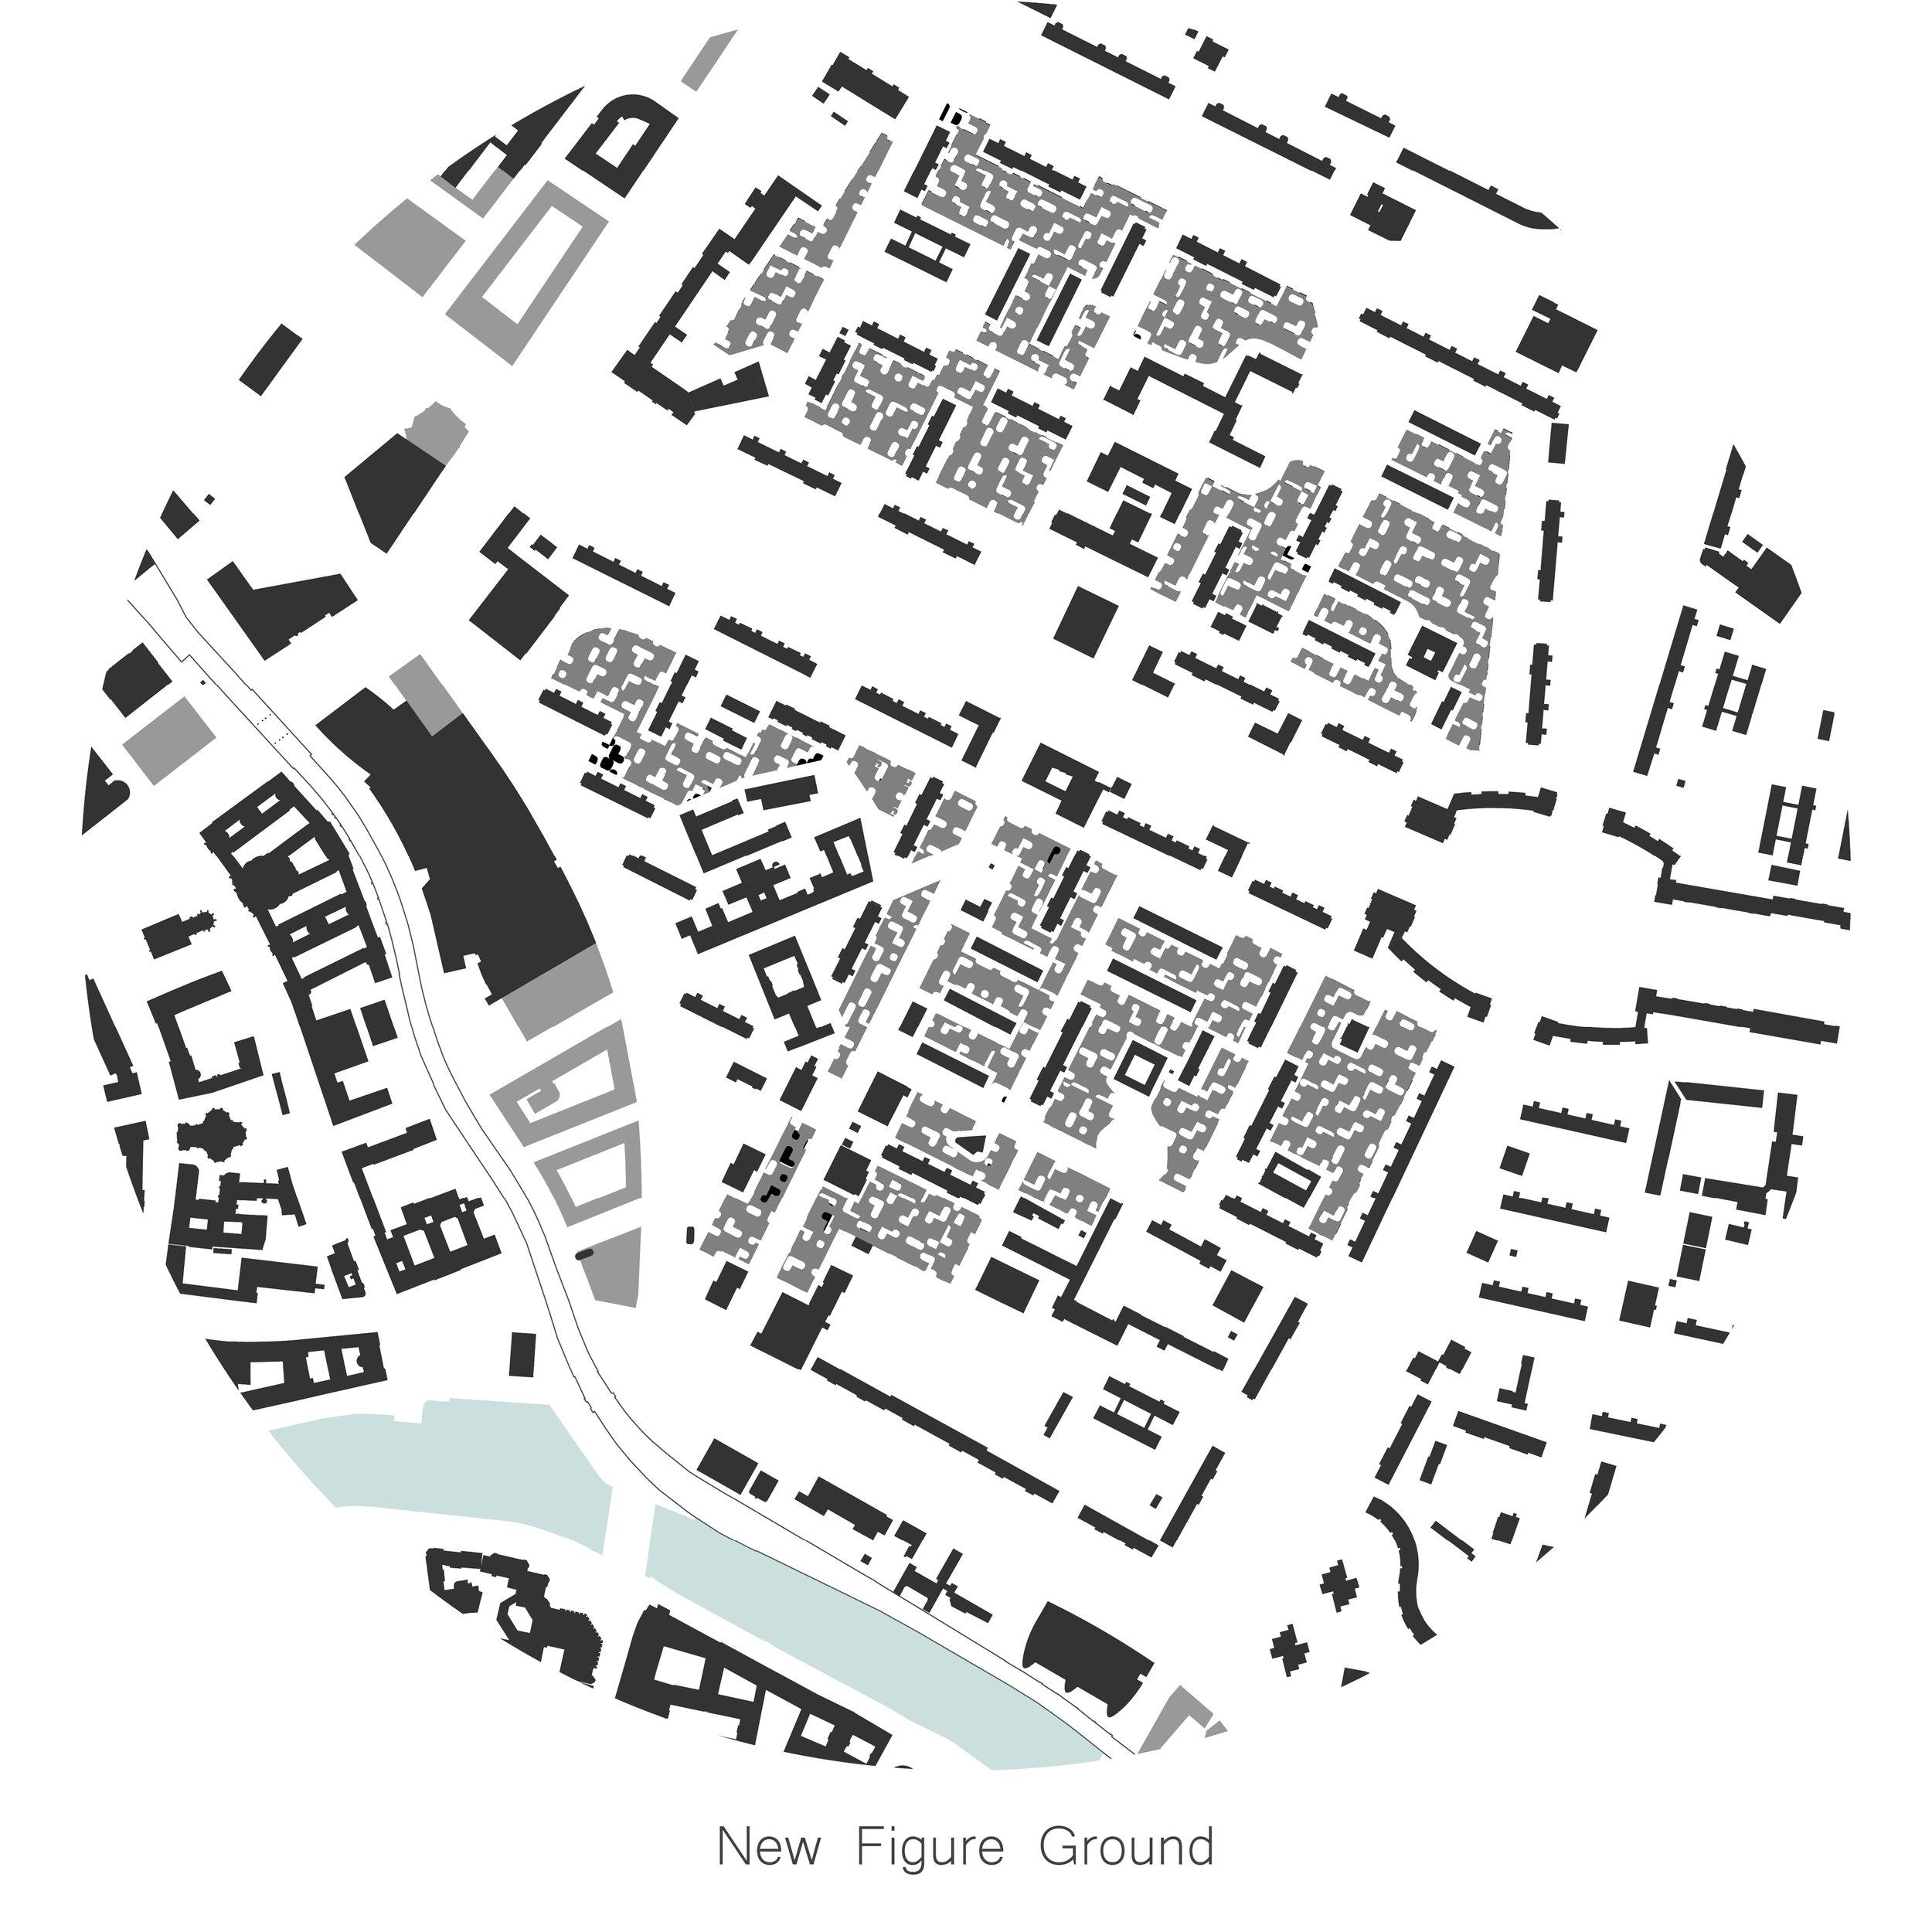 Figure Ground Options2.jpg